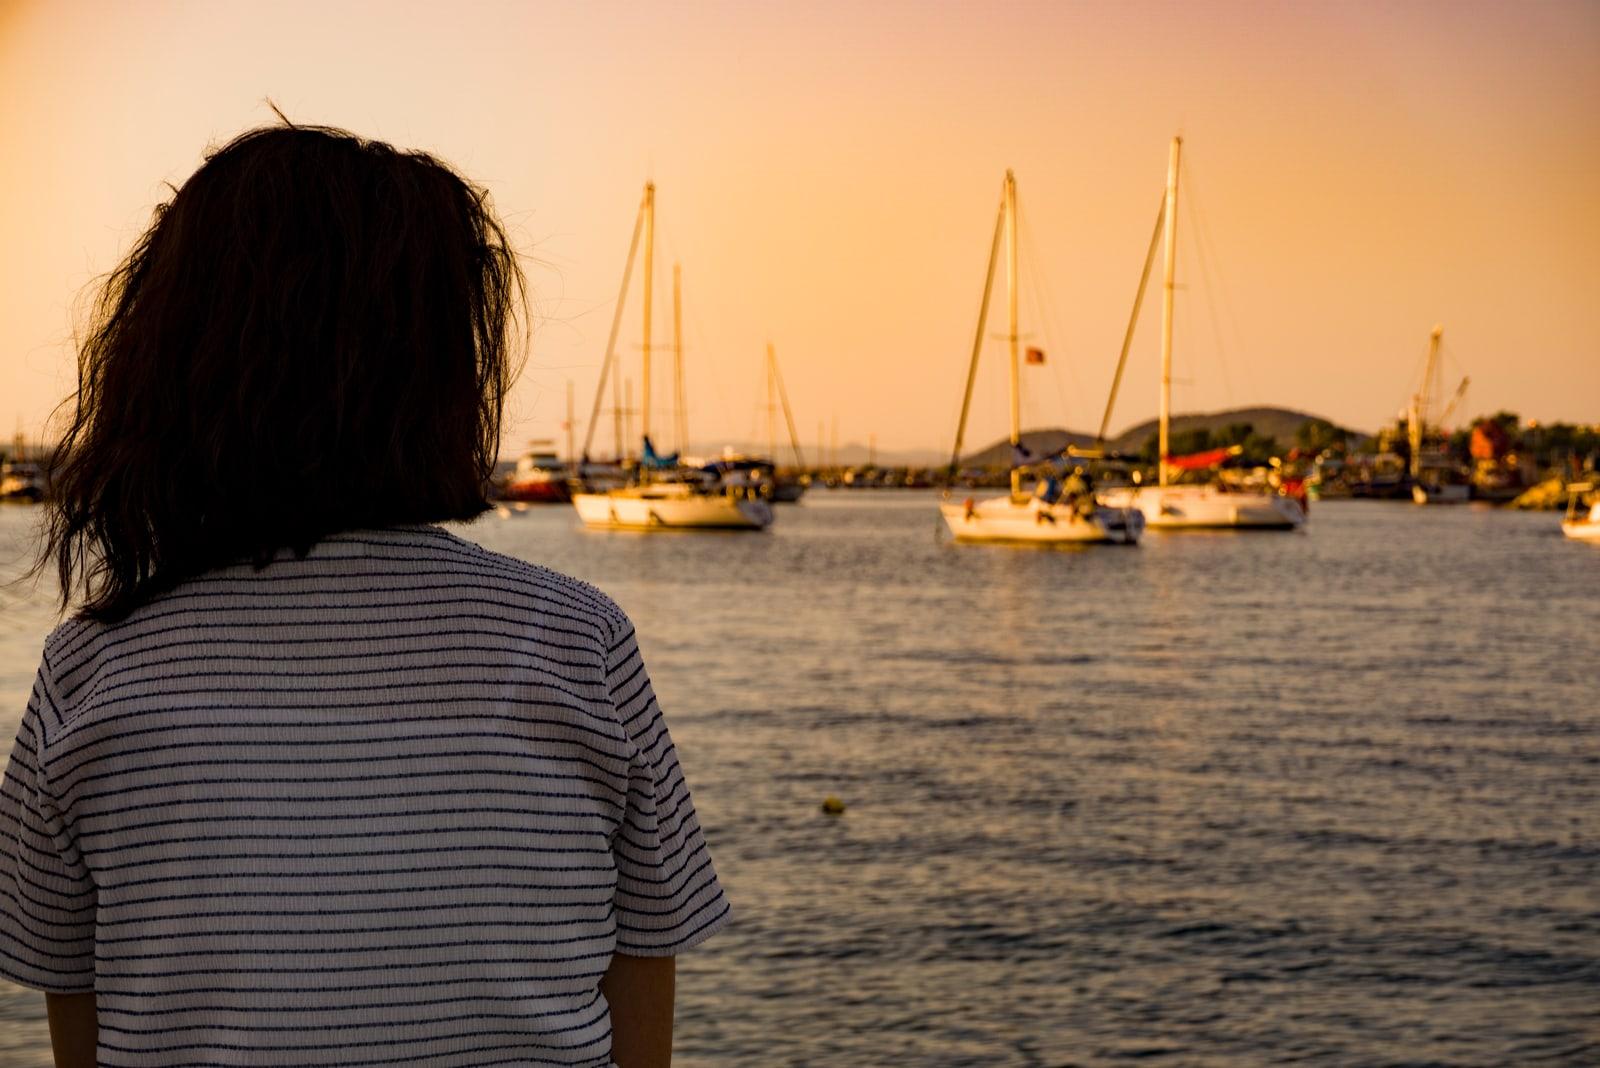 woman sitting alone on seaport coast at sunset